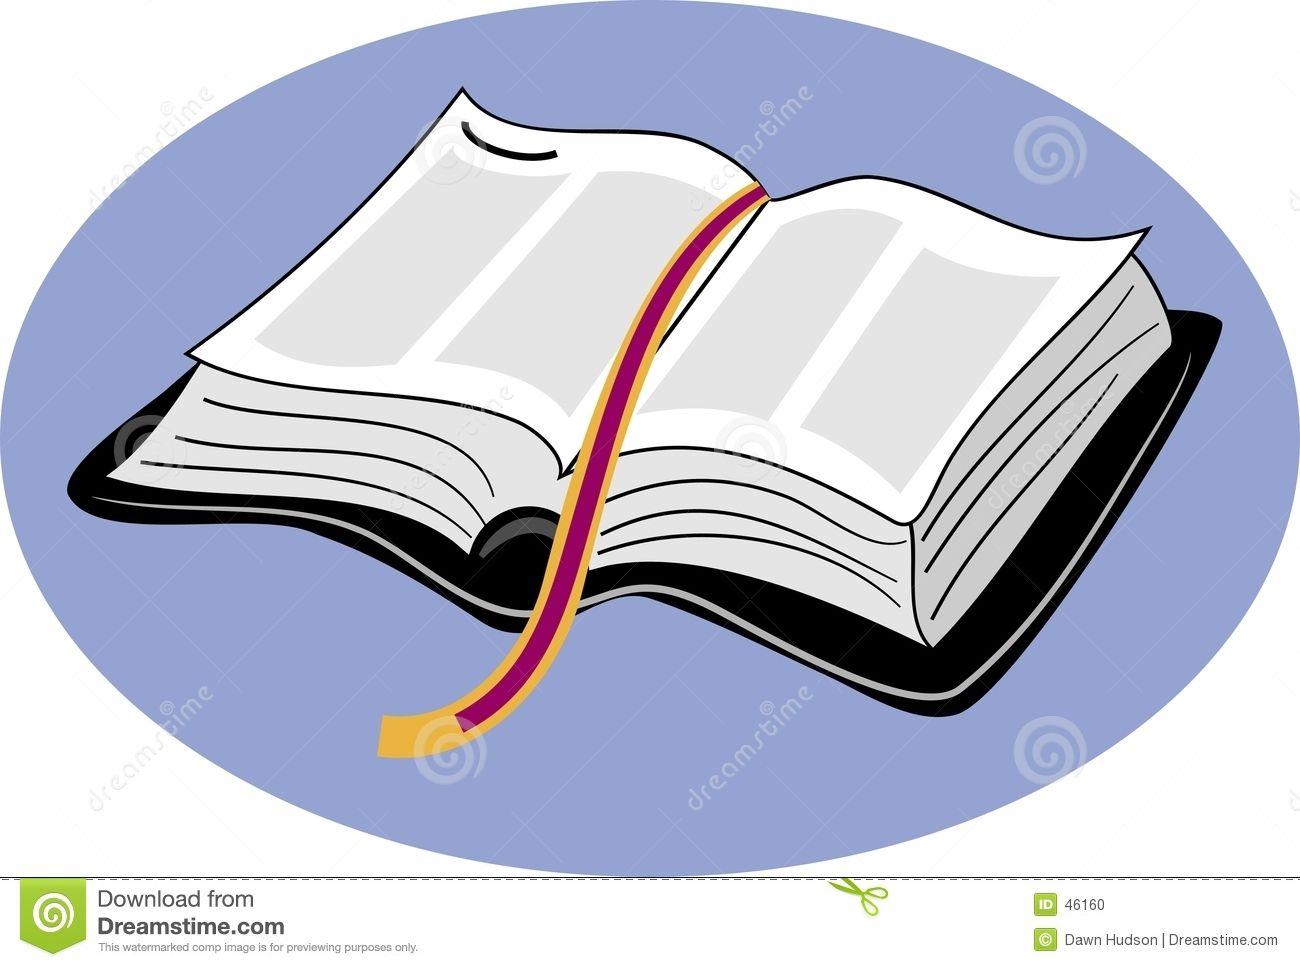 Resultado De Imagen Para Imagen De Biblia Abierta Bible Clipart Holy Bible Bible Images